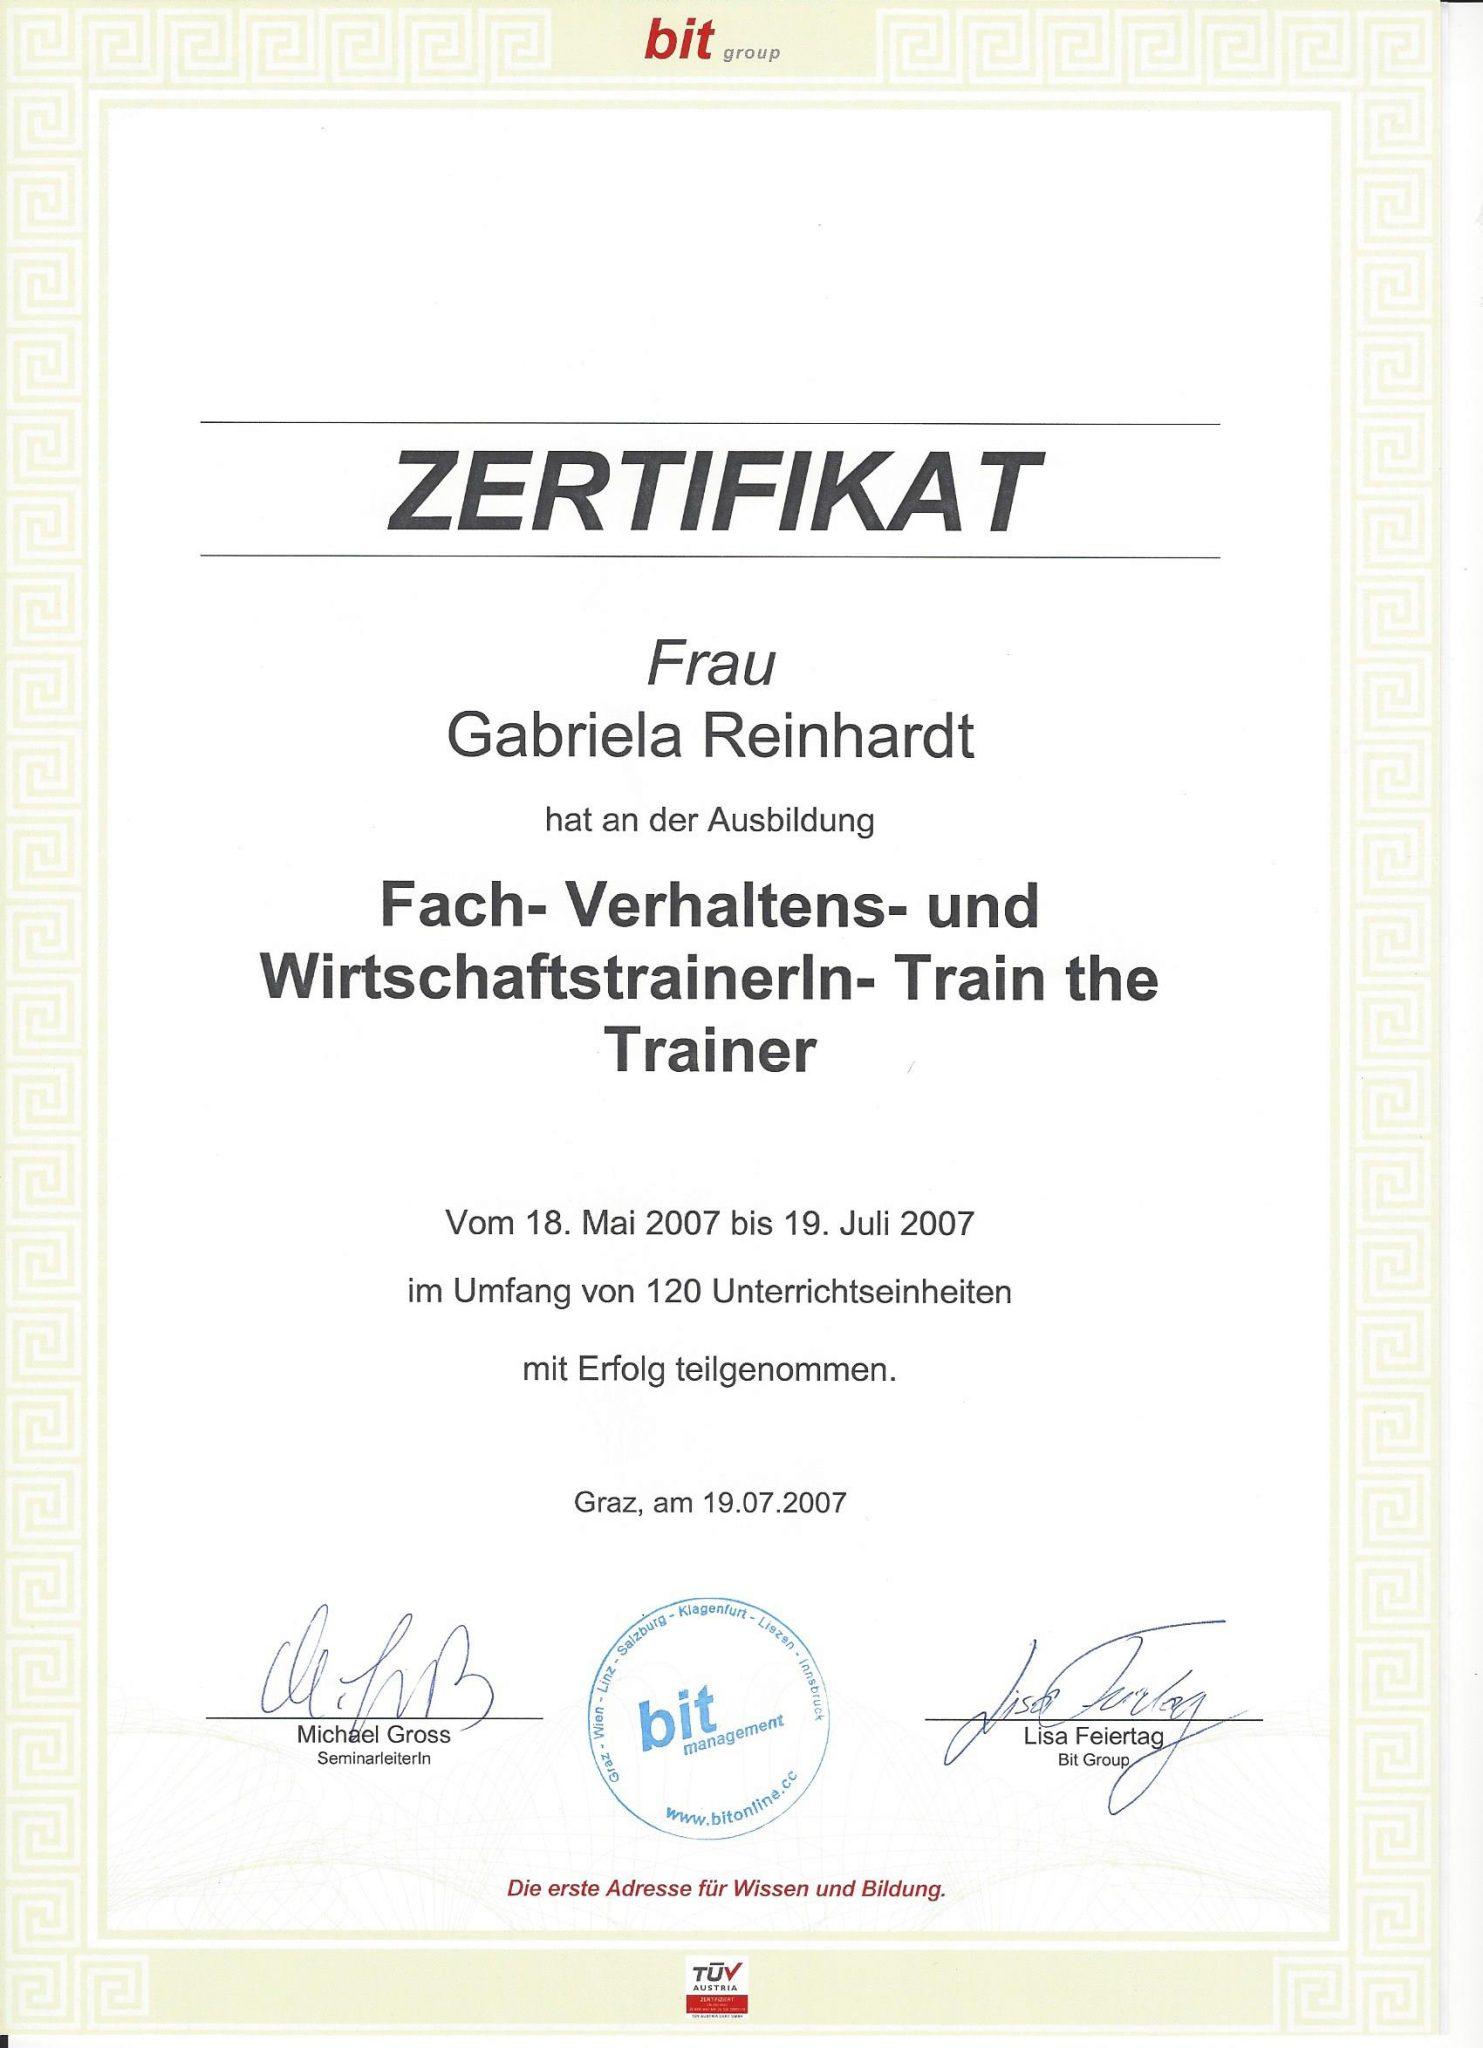 RGH-Consulting | Gabriela Reinhardt | Zertifikate | Zertifikat Trainer Ausbildung